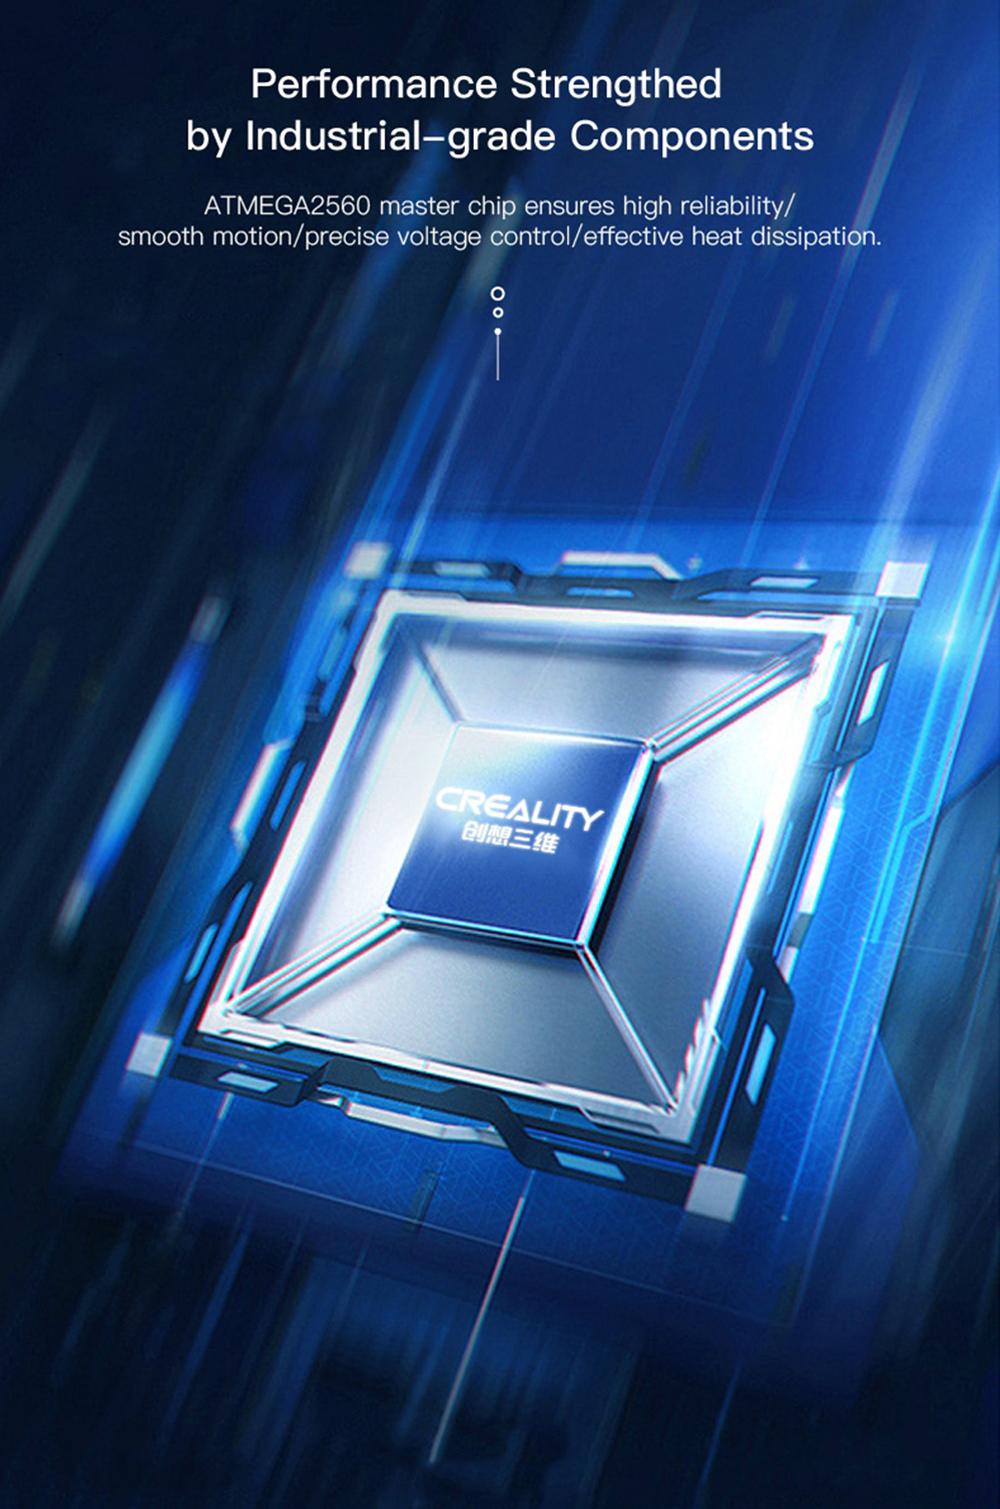 Creality3D CR-5 Pro 3D-Drucker - 300x225x380mm - ATMEGA2560 Chip auf Industrieniveau